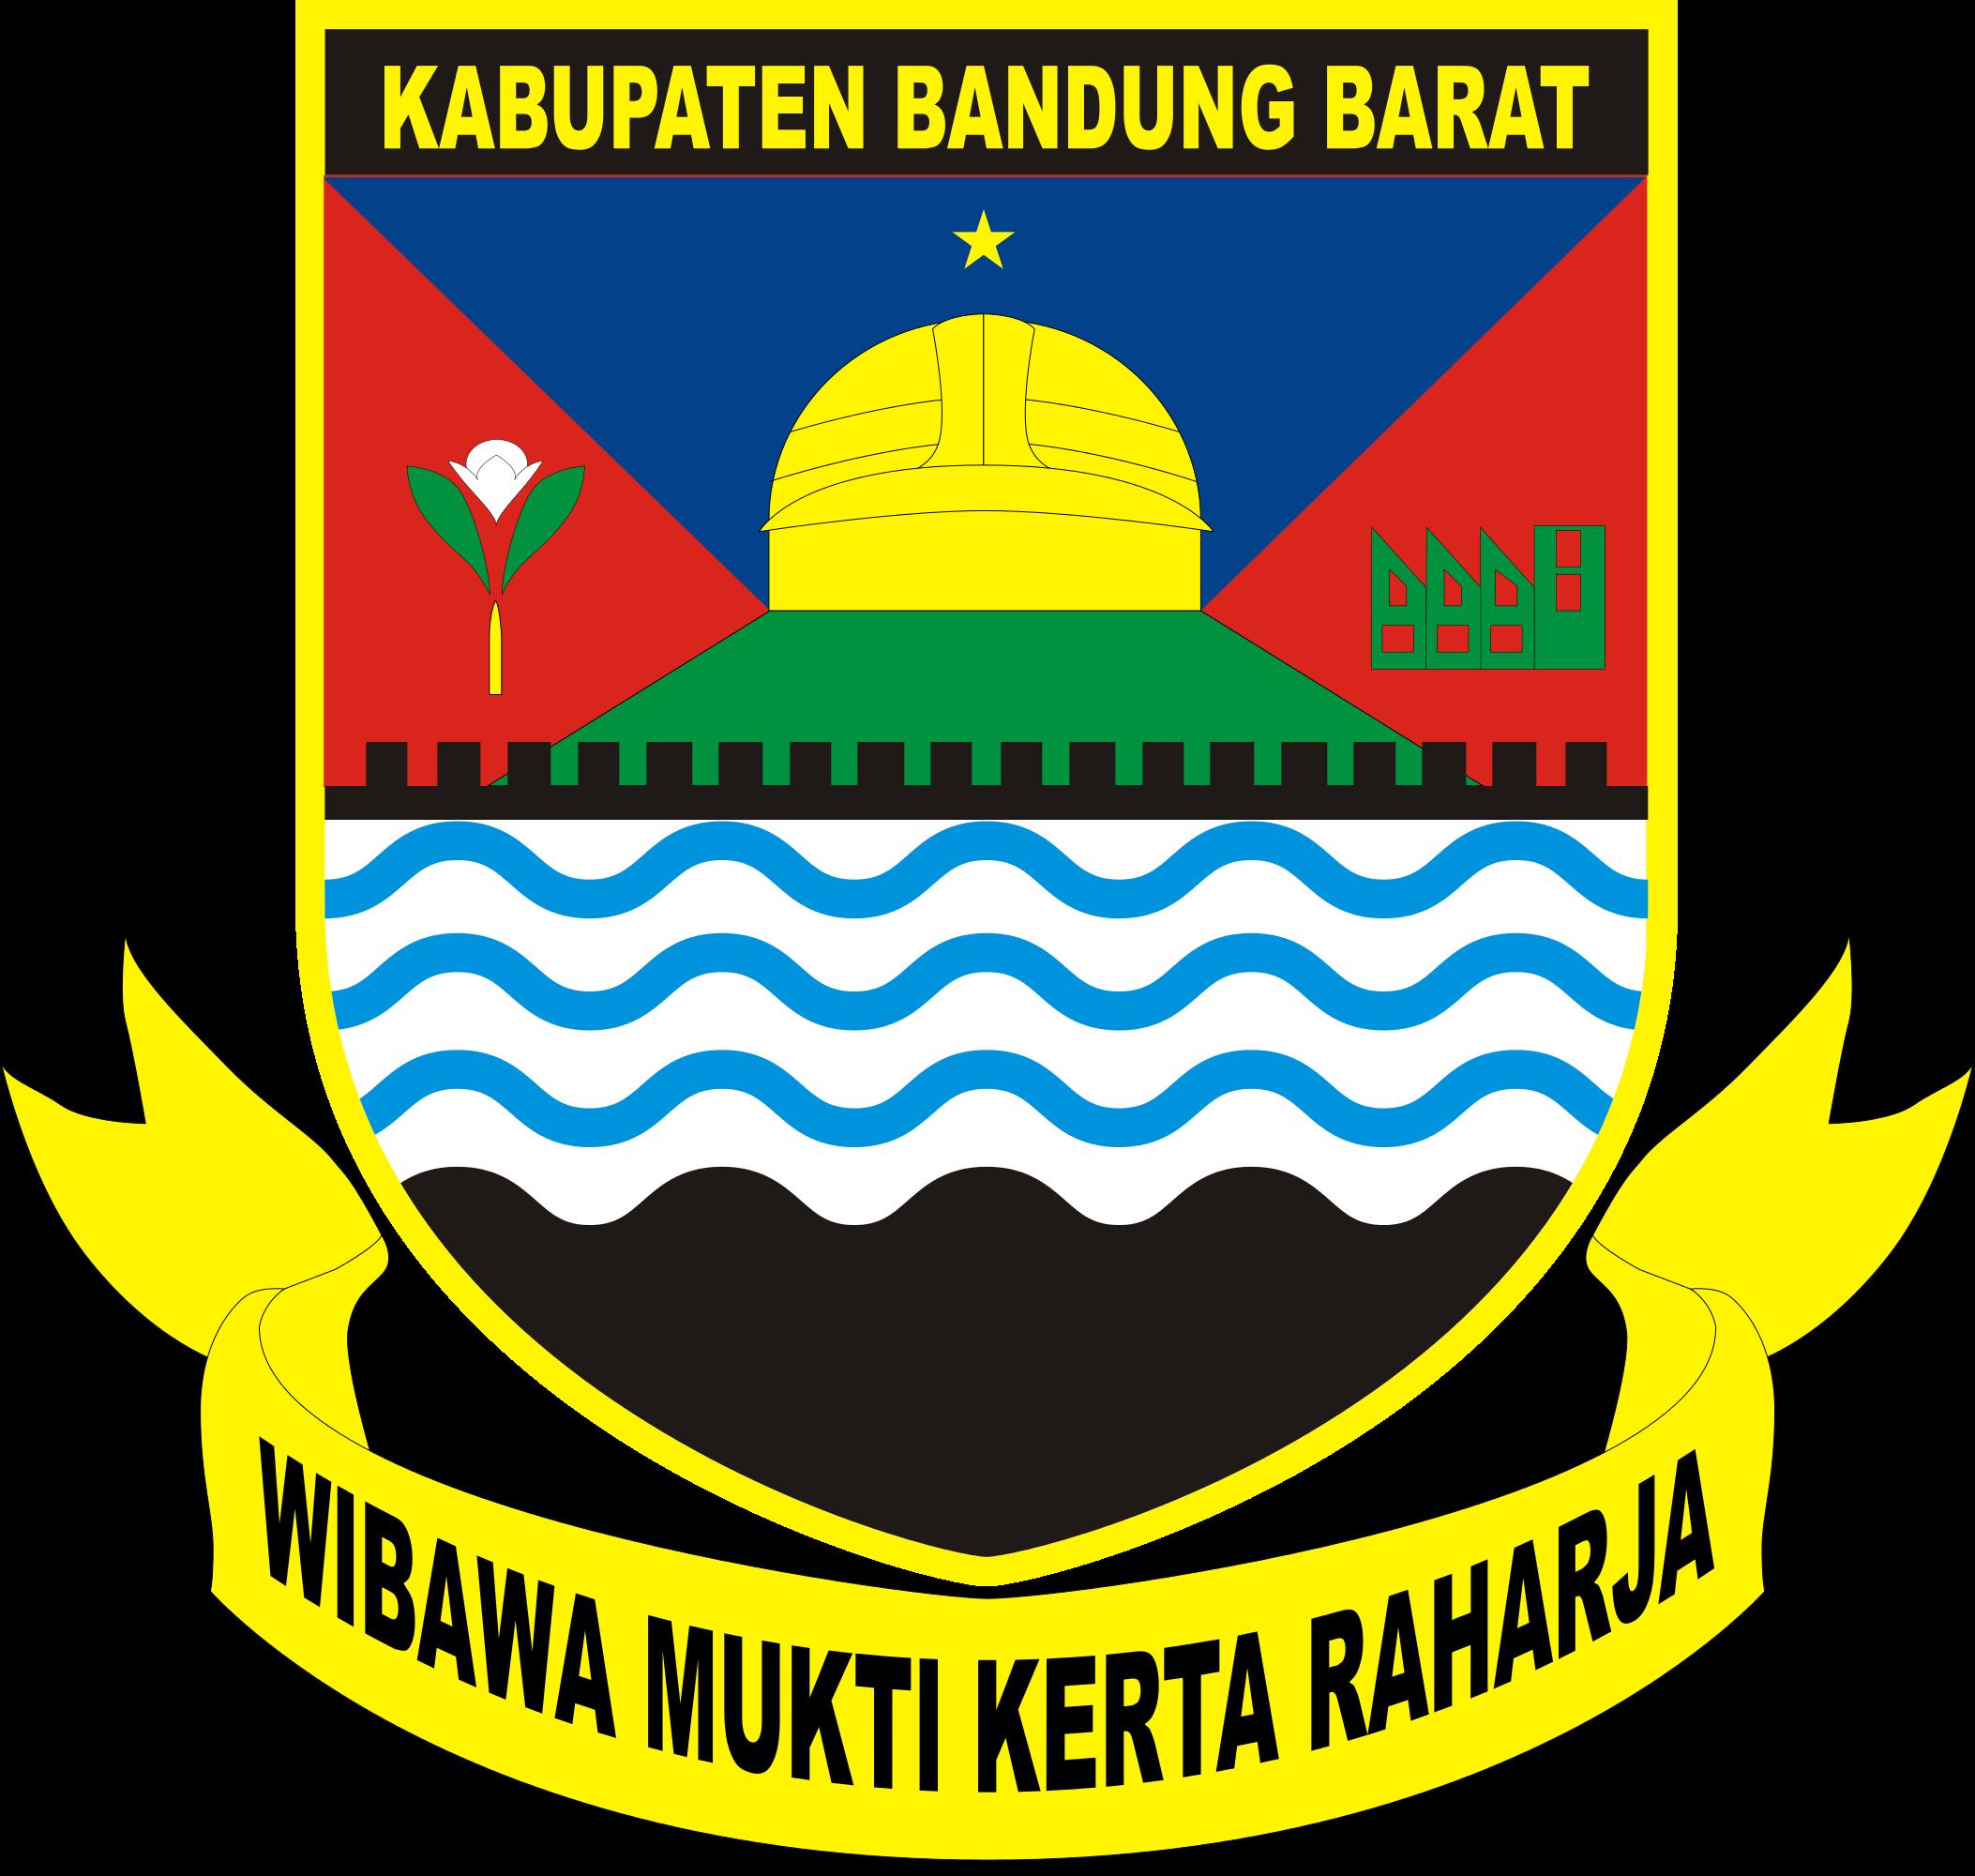 File:Kab Bandung Barat.svg - Barat PNG